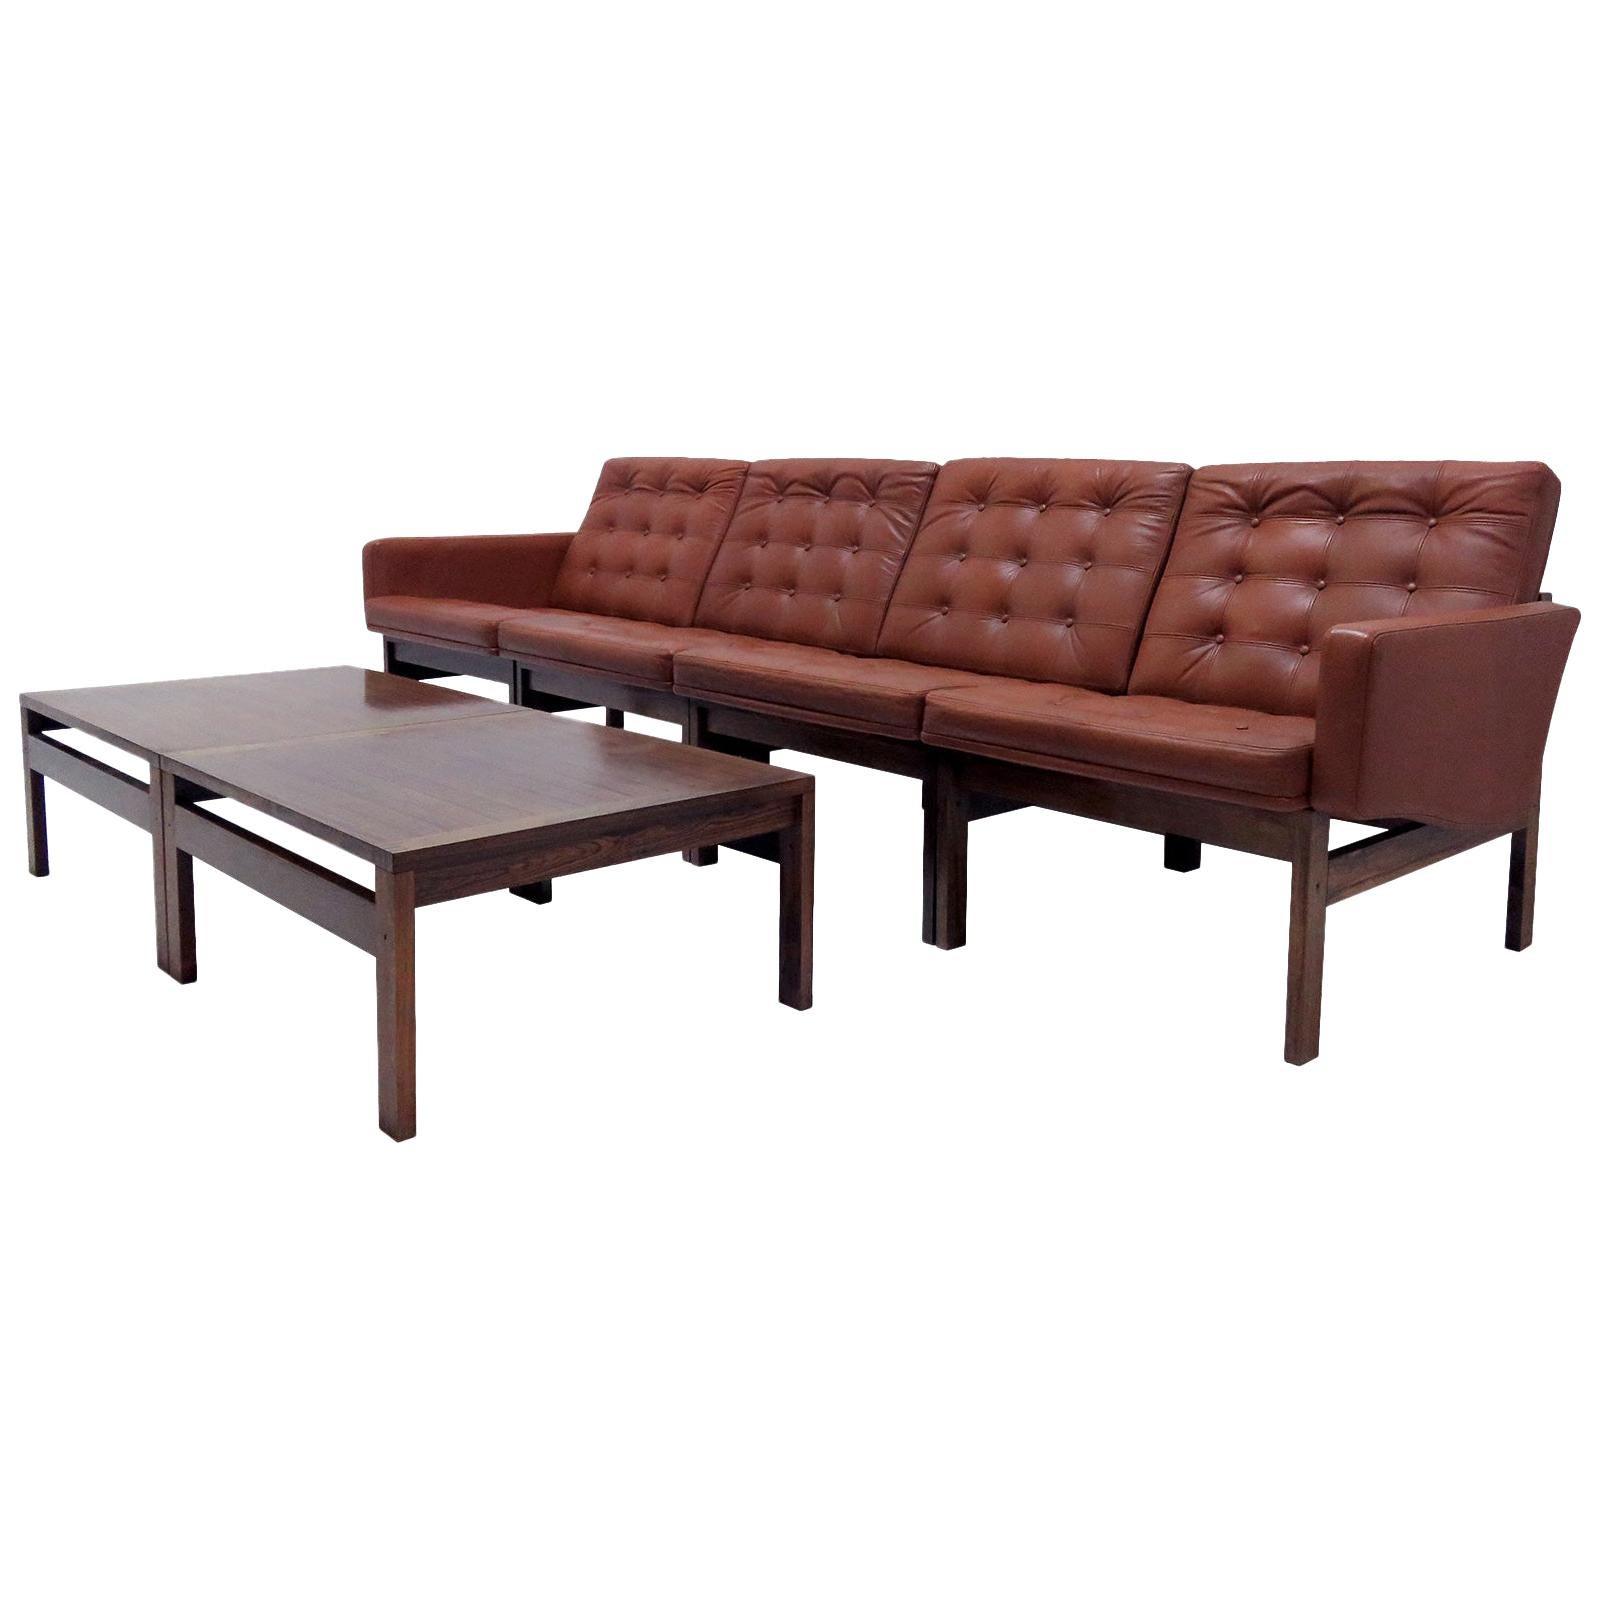 Ole Gjerlov-Knudsen & Torben Lind 'Moduline' Leather Seating Set, 1962